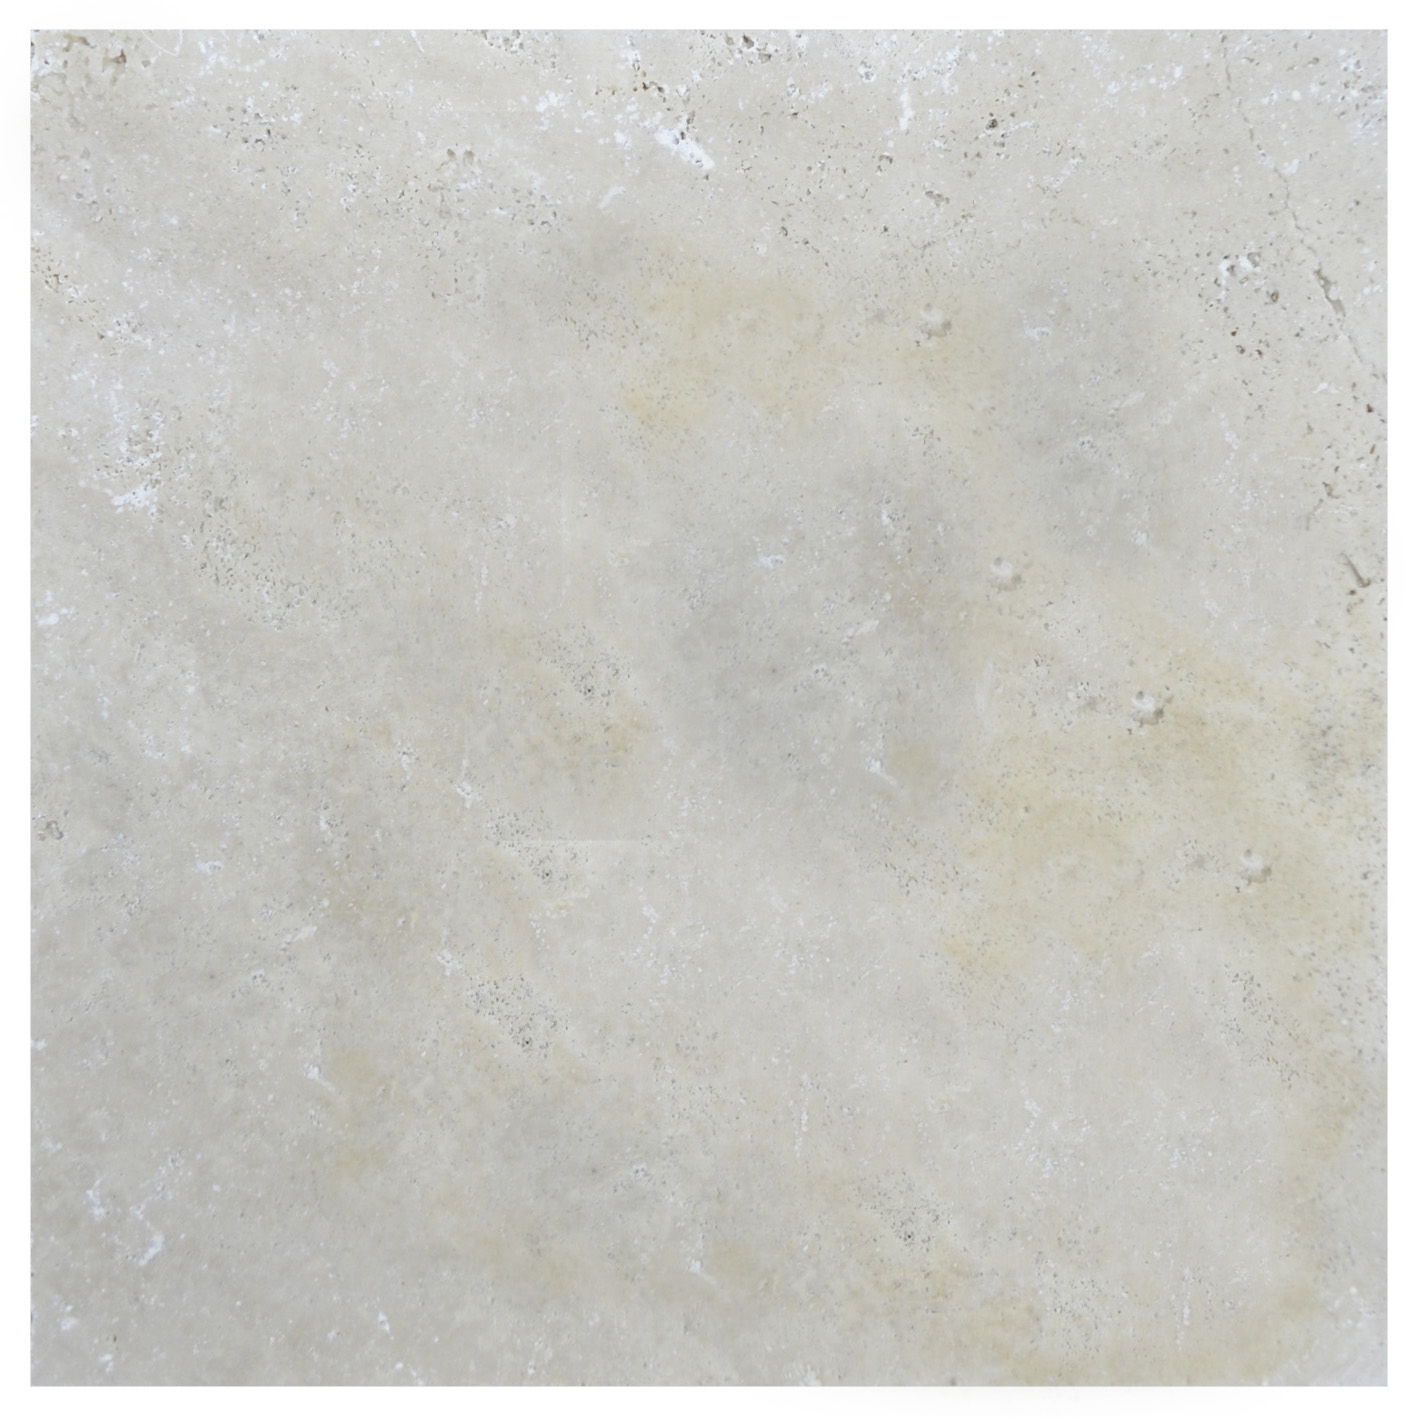 Ivory Tumbled Travertine Pavers 24x24